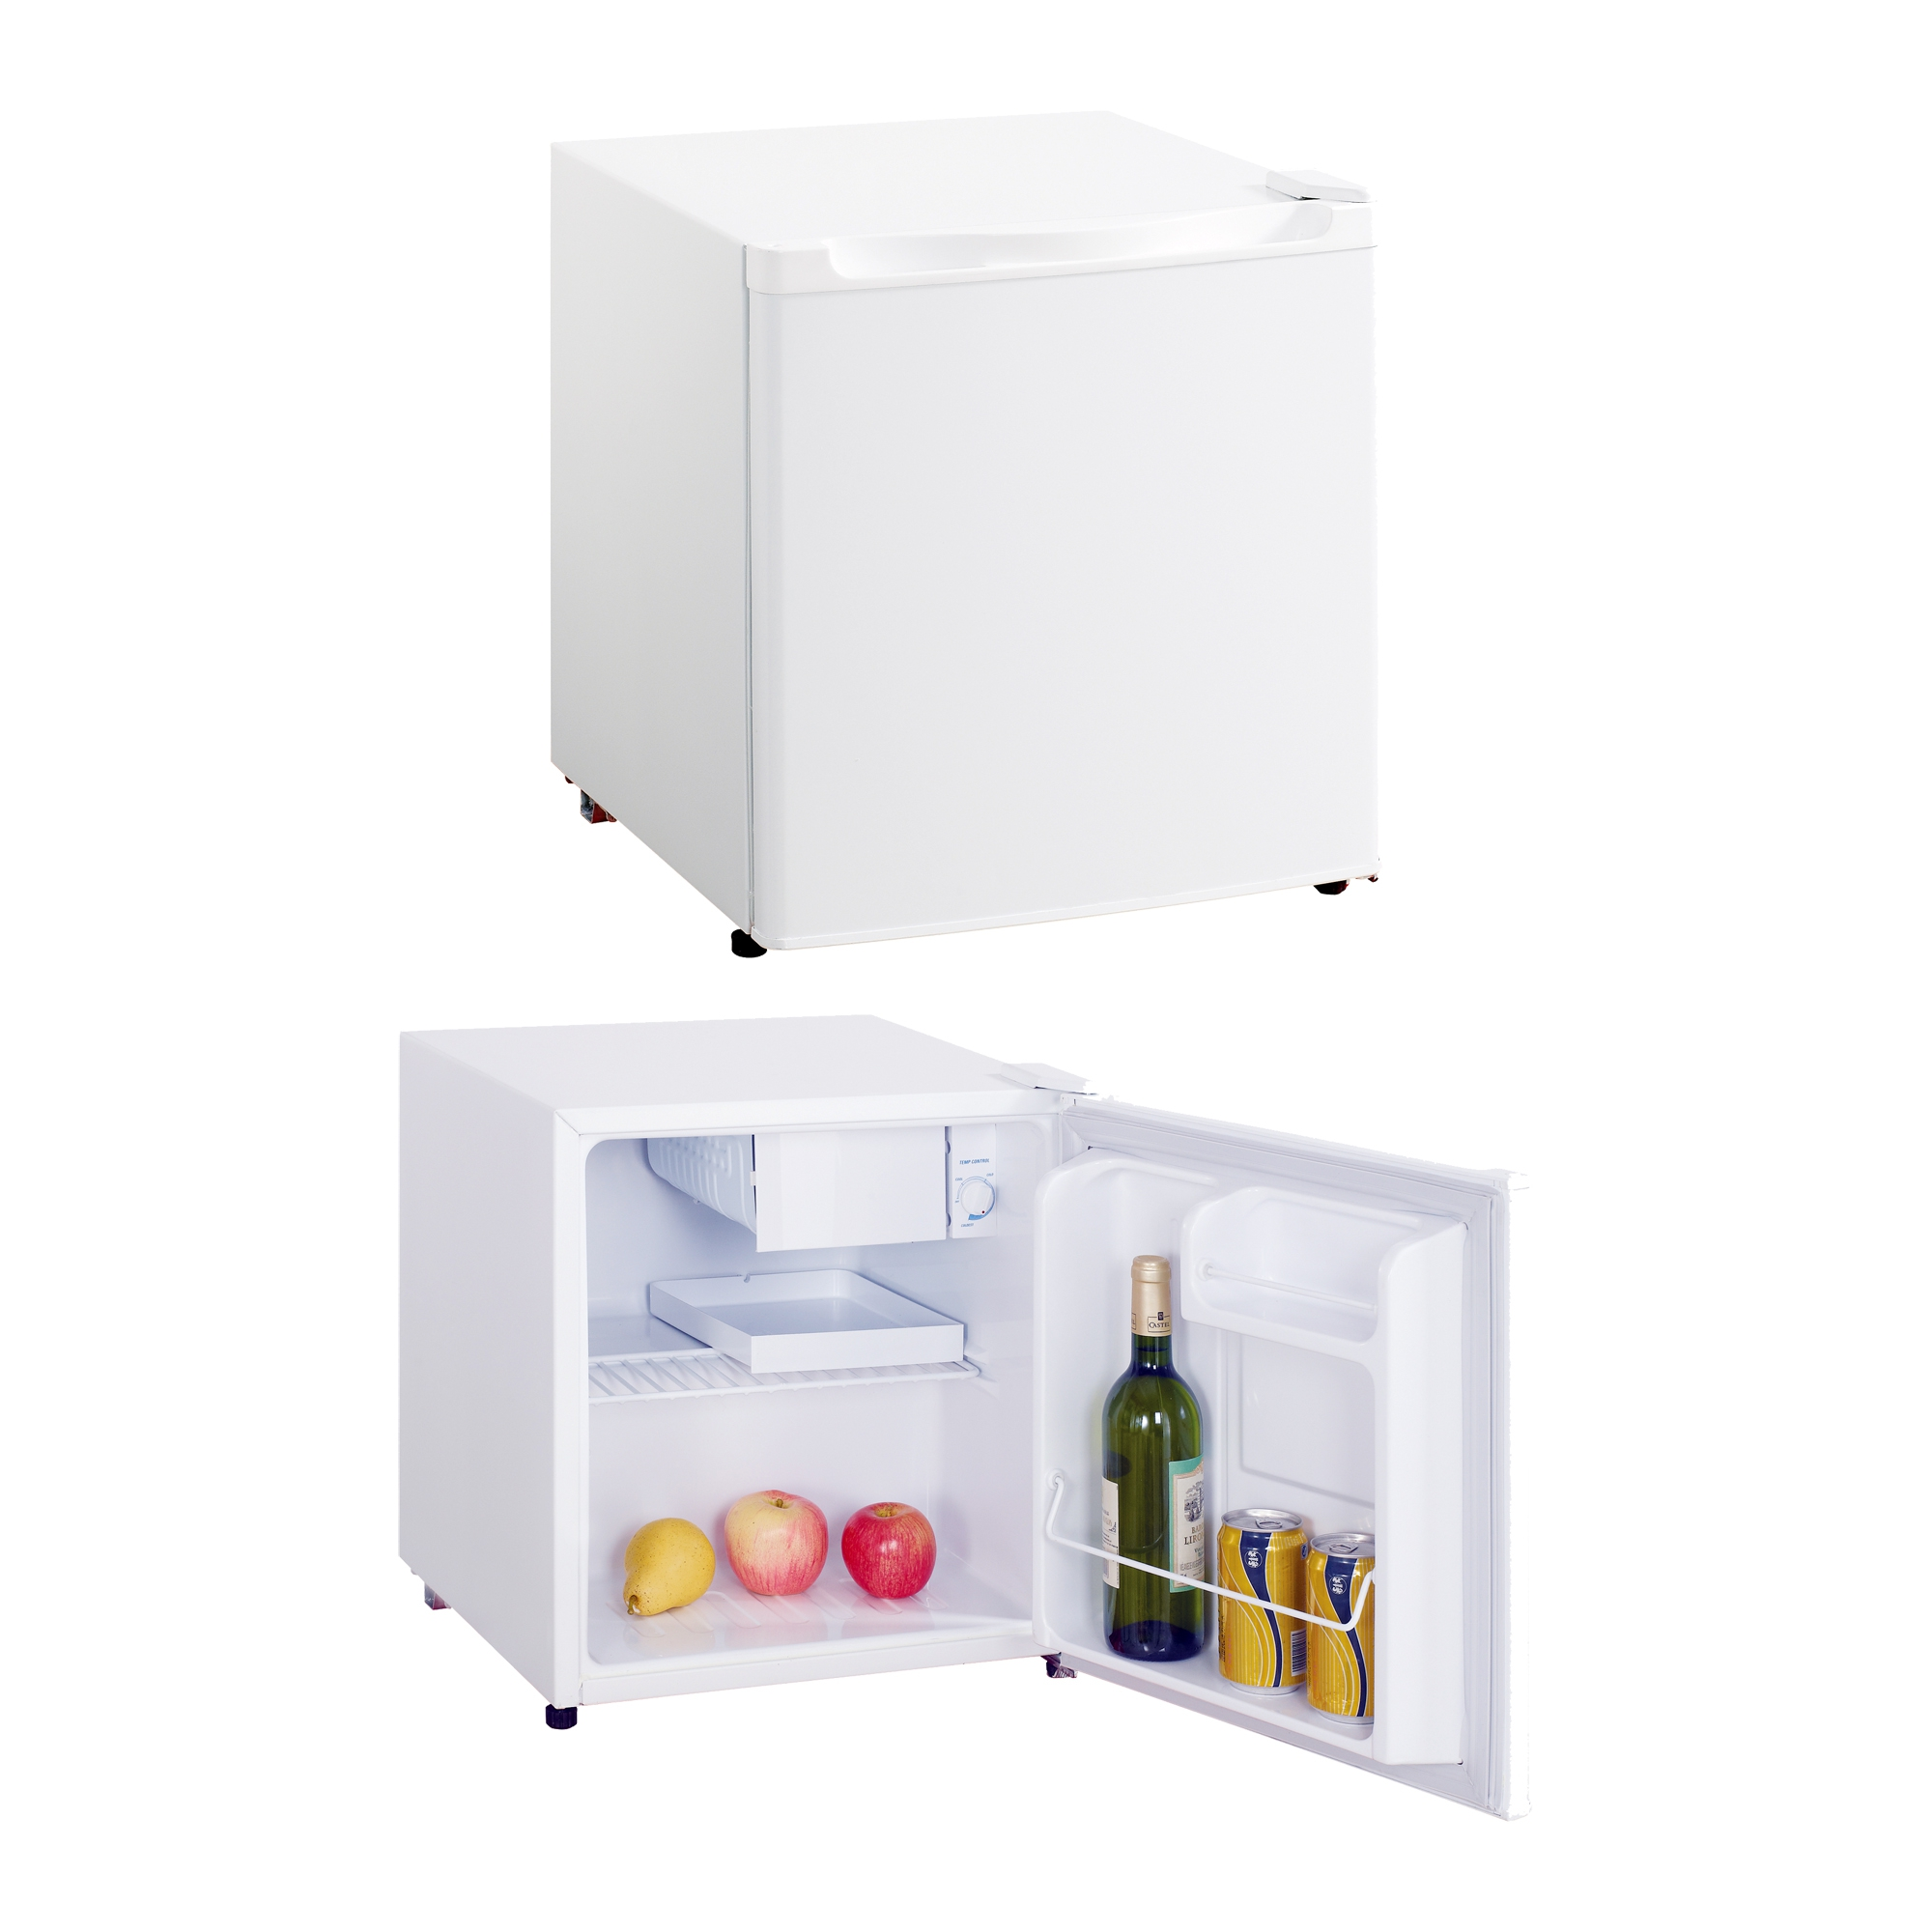 IMPECCA 1.7 CU FT Compact Refrigerator, White